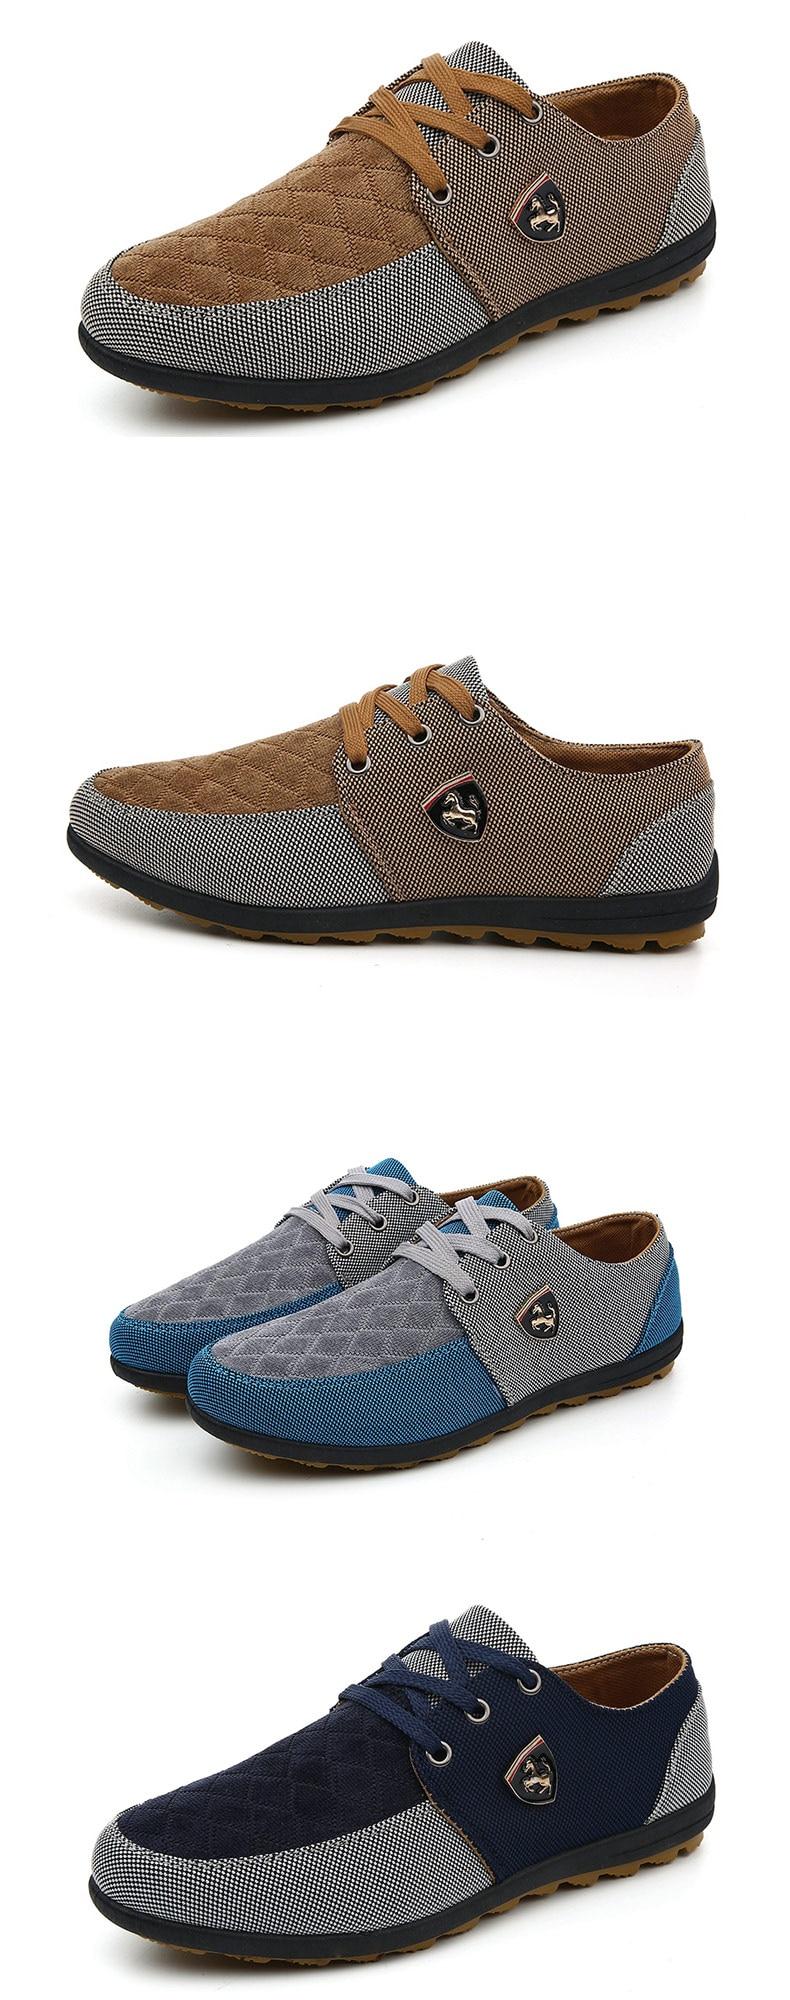 18 Fashion Canvas Shoes Men Casual Shoes Summer Breathable Yellow Comfortbale Espadrilles Sneakers Men Flats Shoes Big Size 16